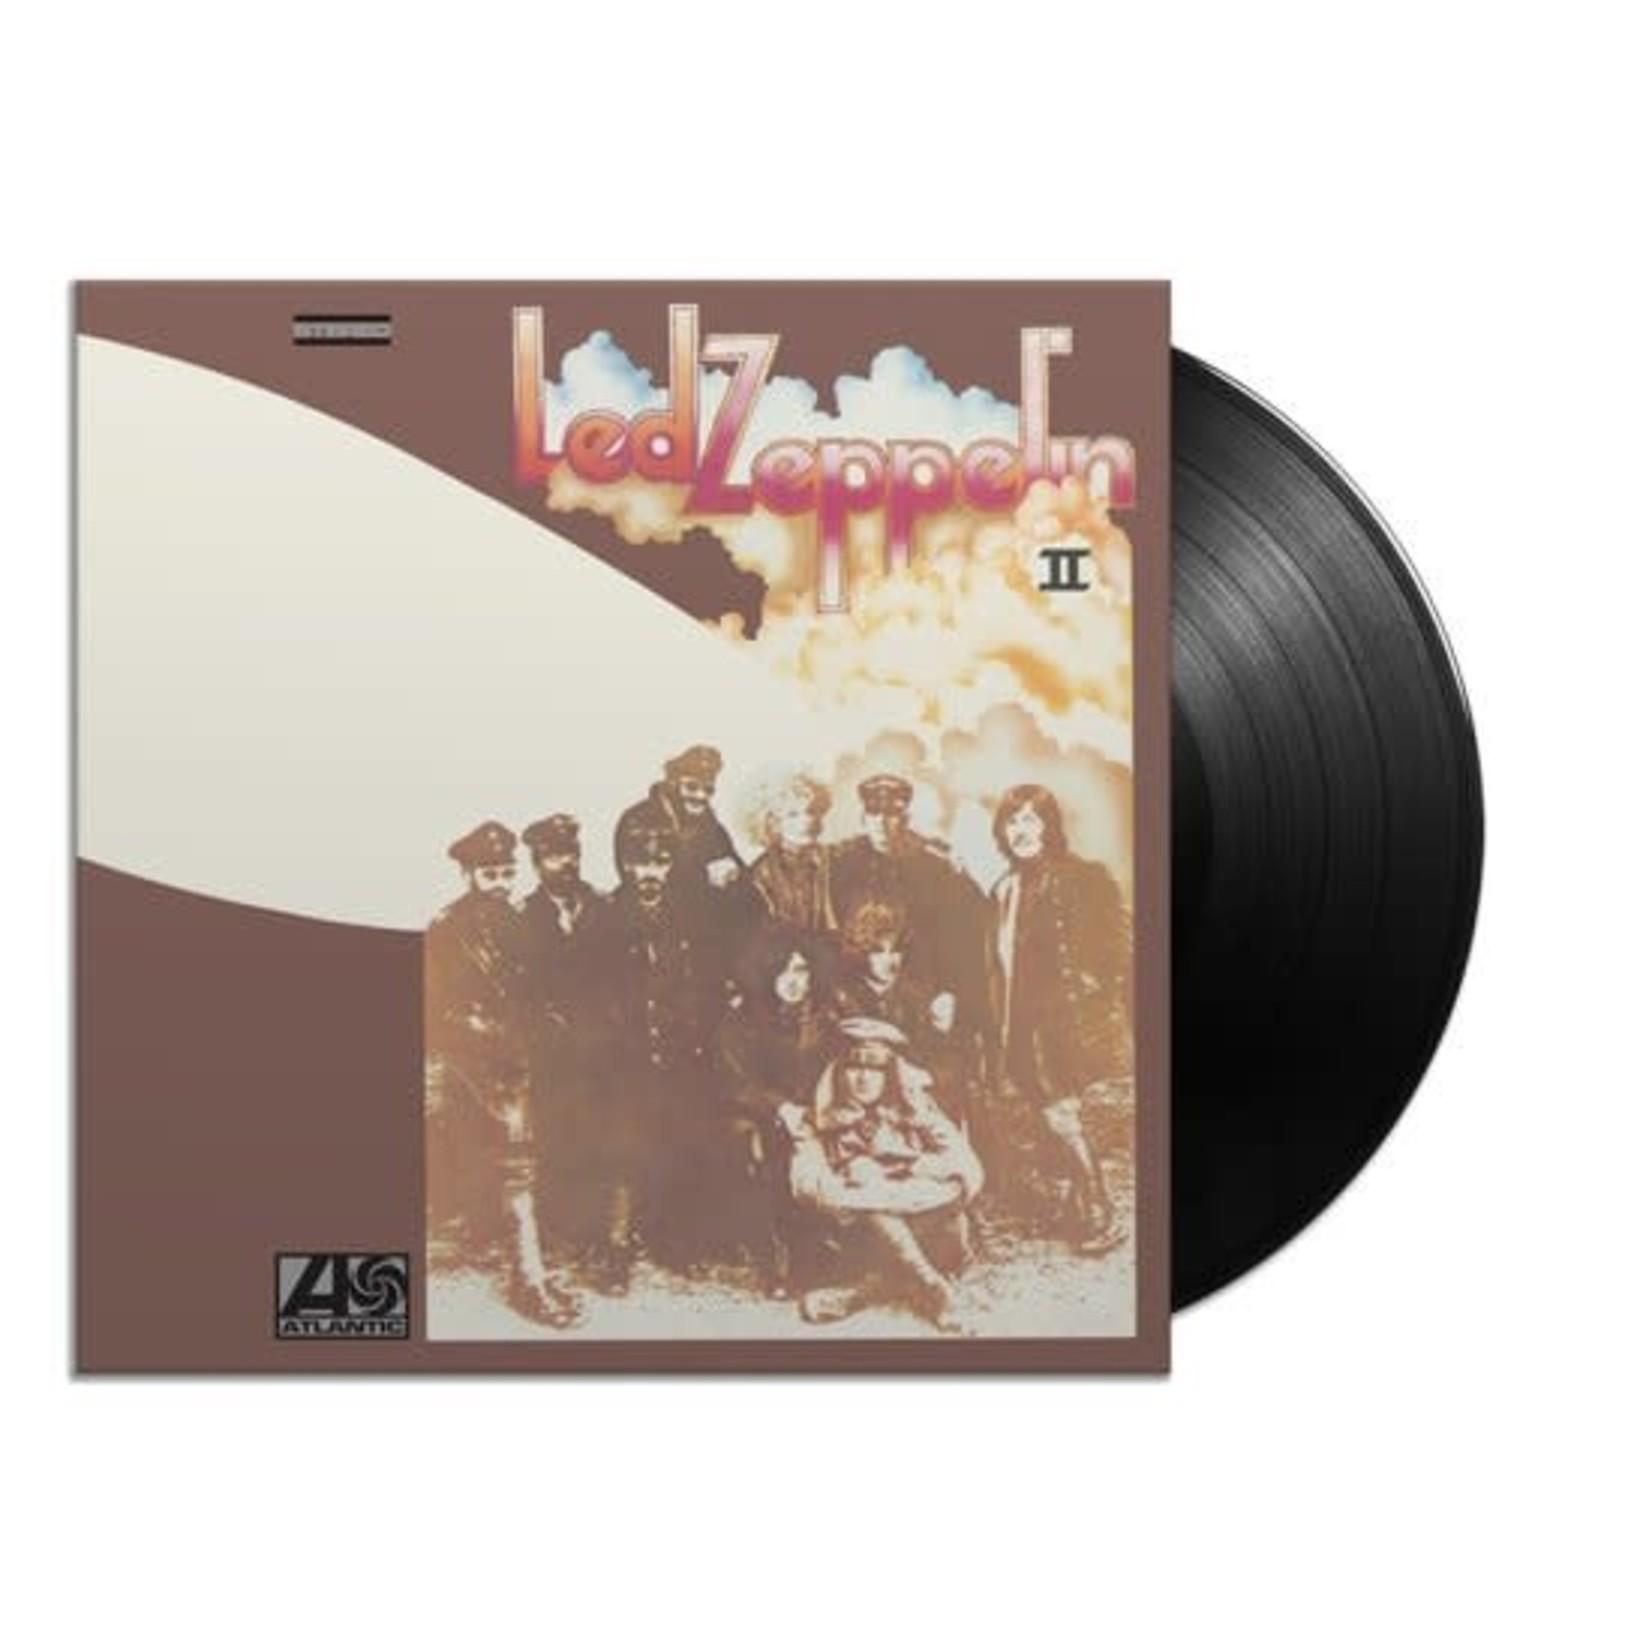 Led Zeppelin - II   (VINYL)